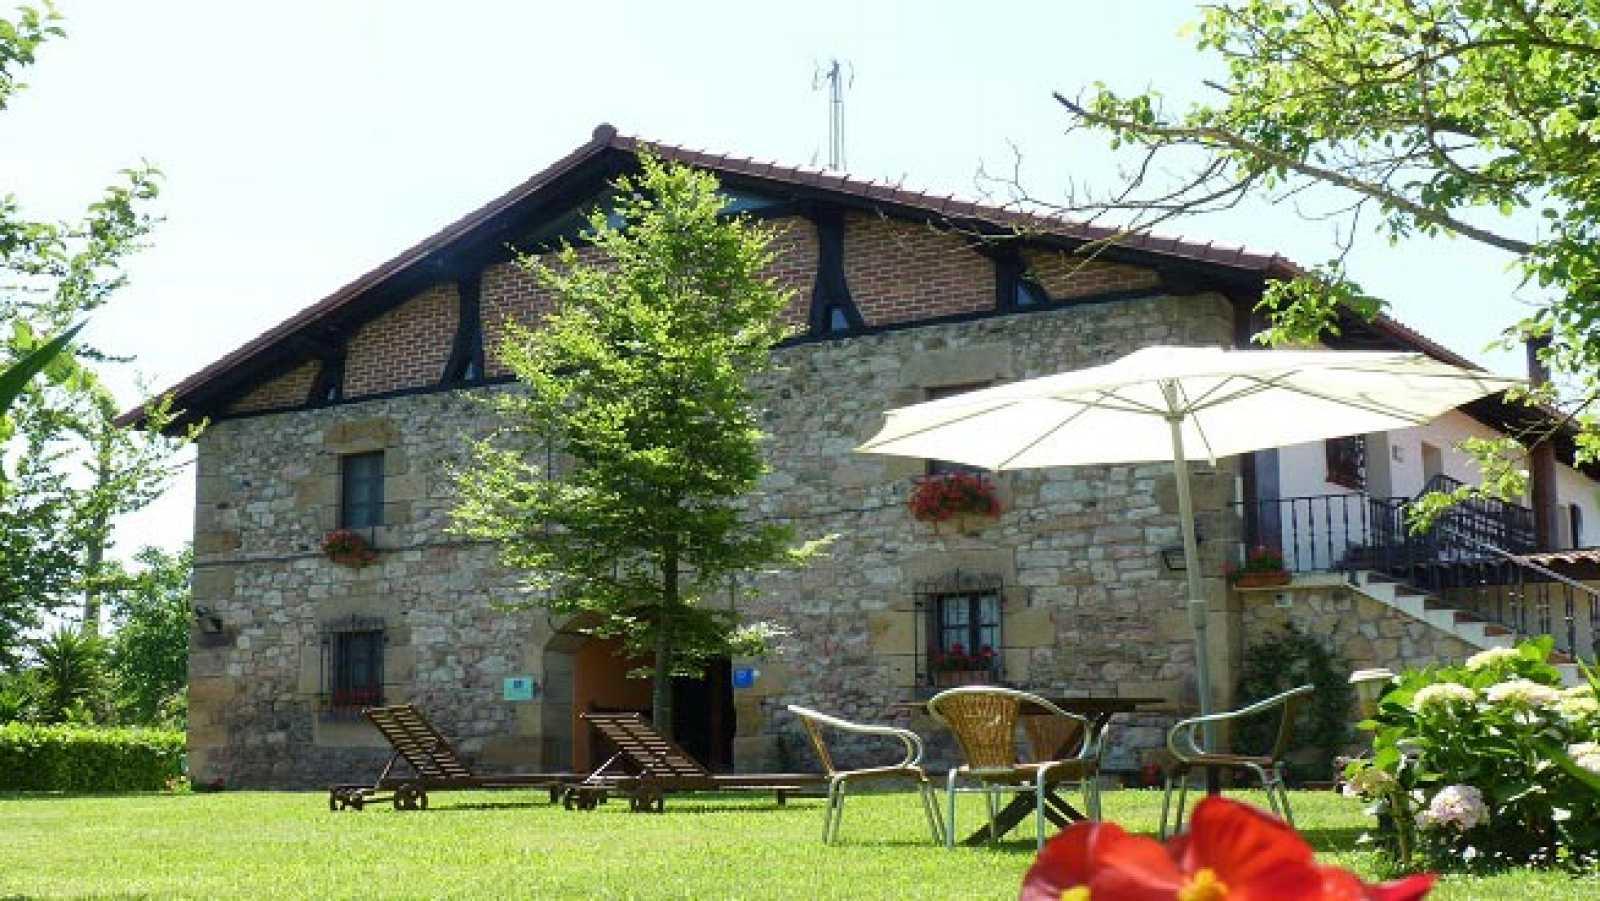 En clave Turismo - Mejor Hotelero de Turismo con Encanto: Ramón Oliden de casa rural Jesuskoa - 19/02/21 - escuchar ahora